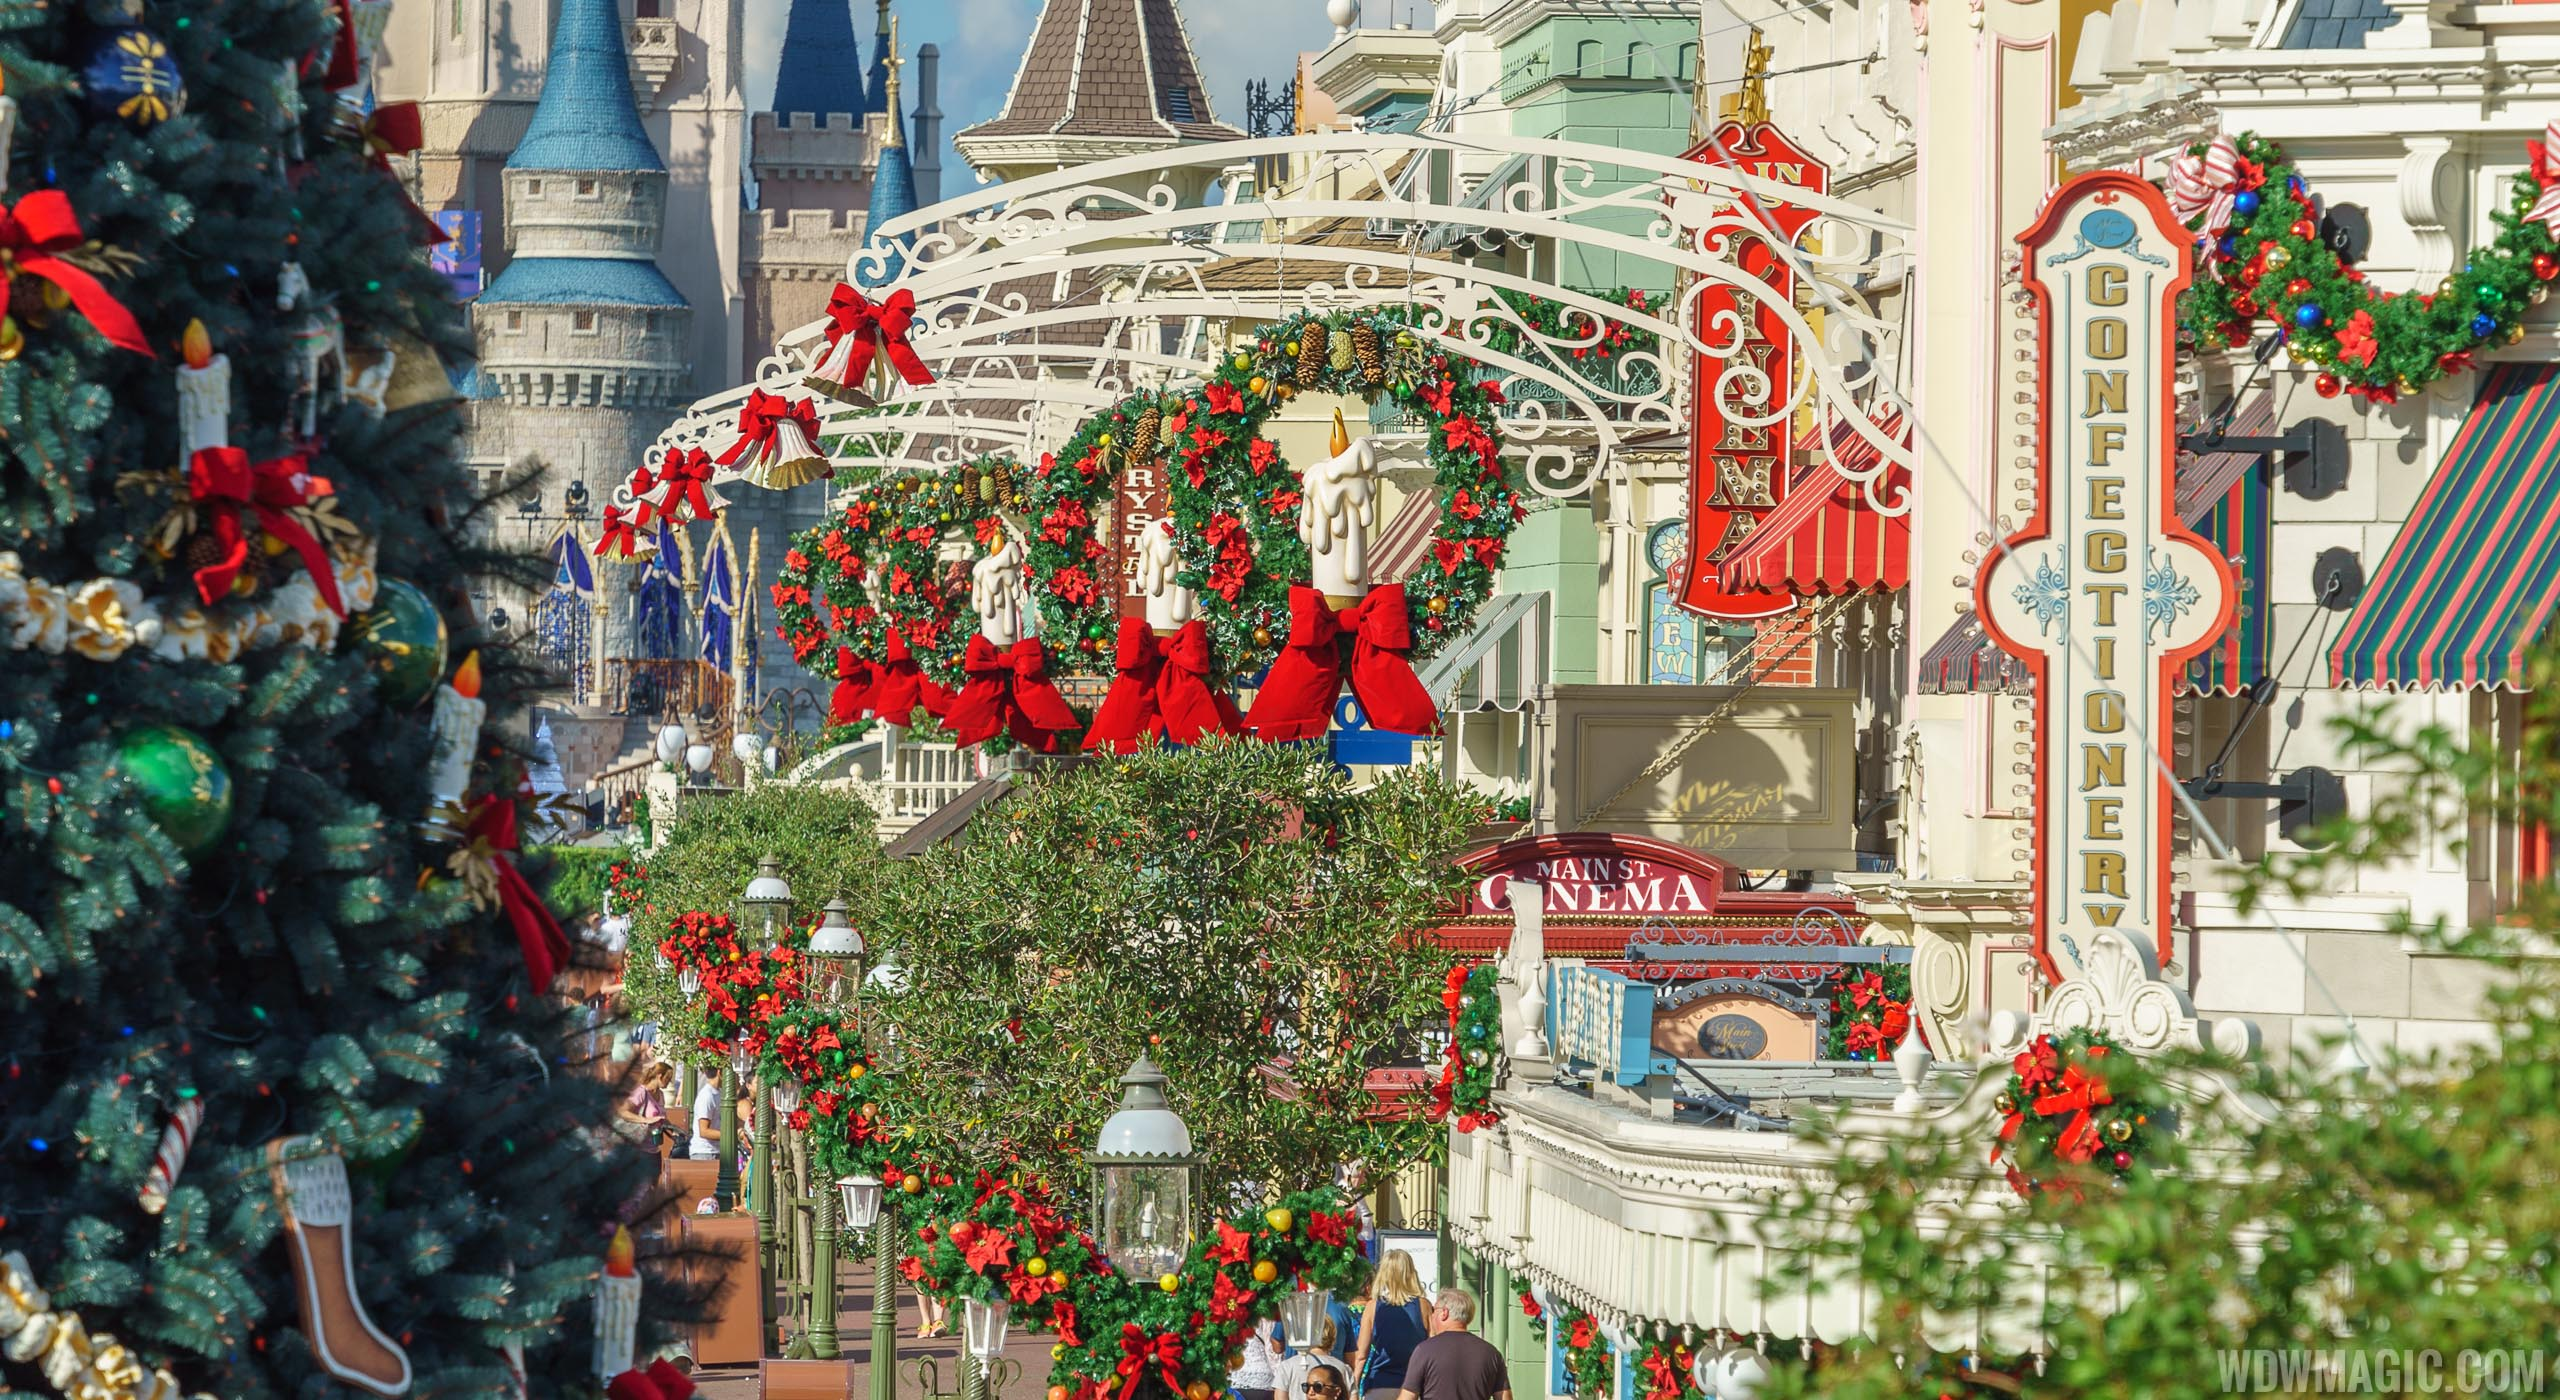 the magic kingdoms 2018 christmas holiday decor - When Do Christmas Decorations Go Up At Disney World 2017